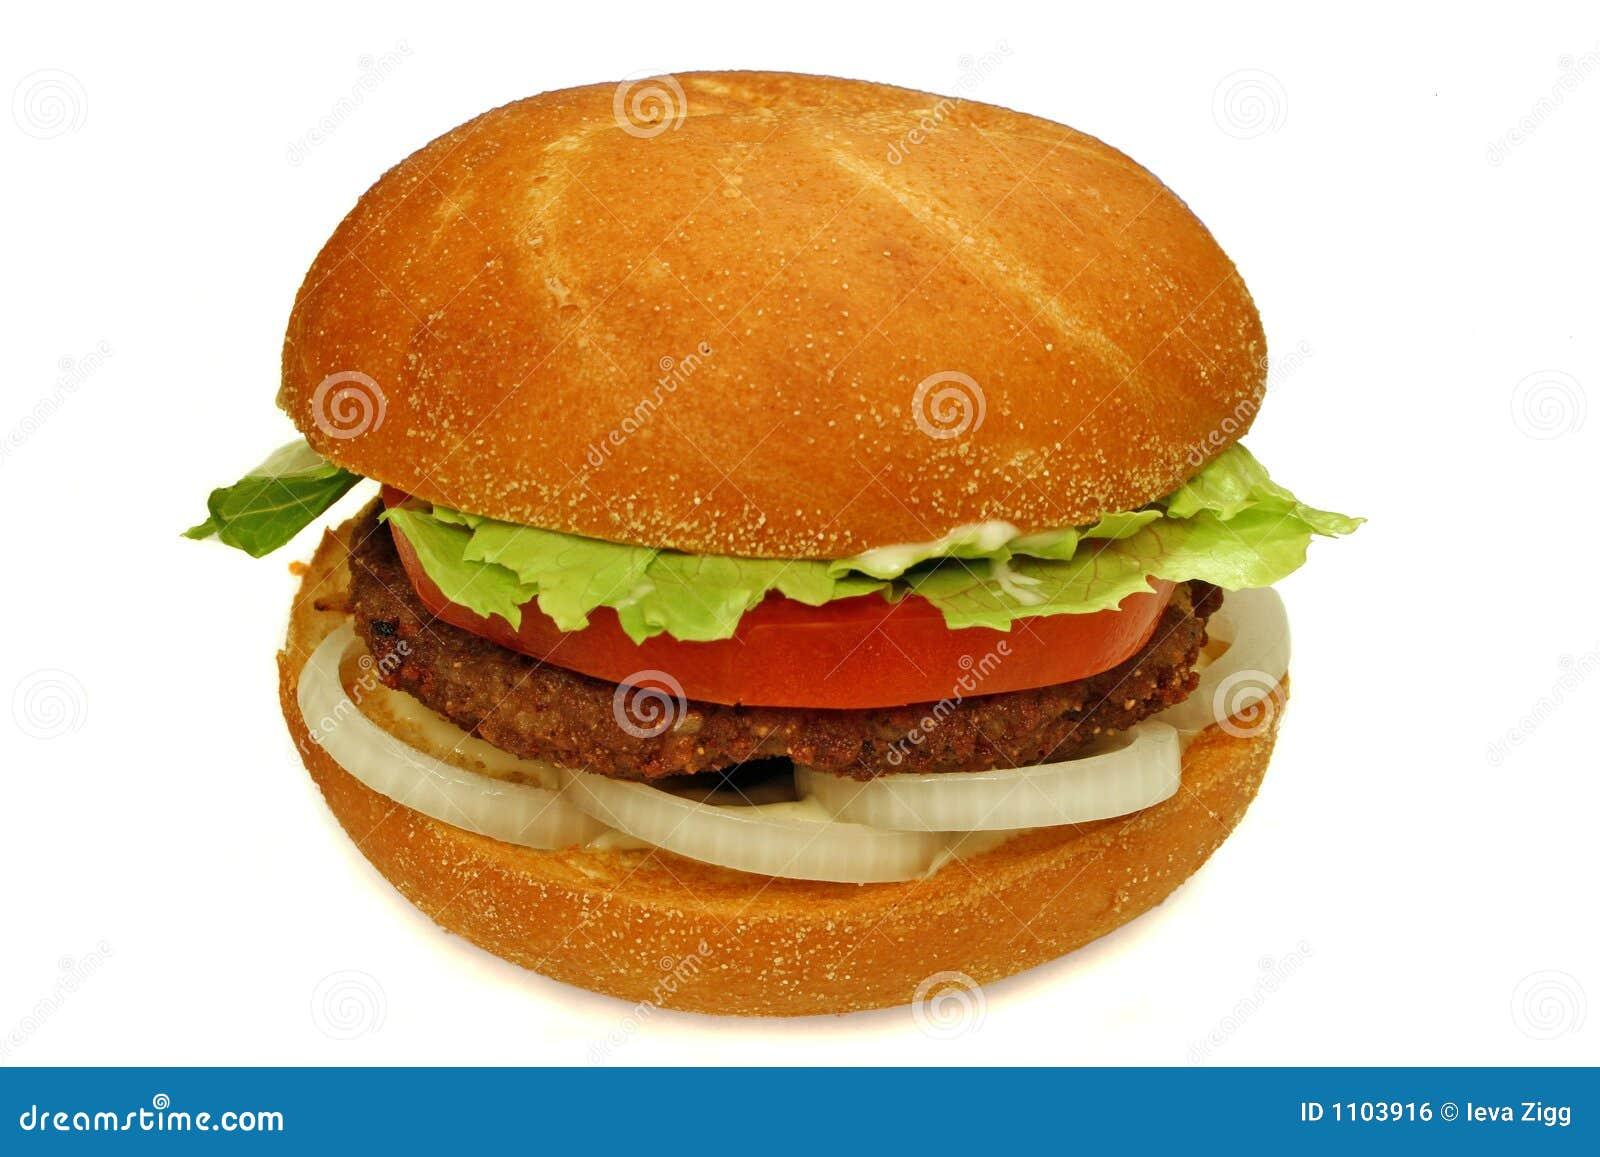 Burger Royalty Free Stock Image Image 1103916